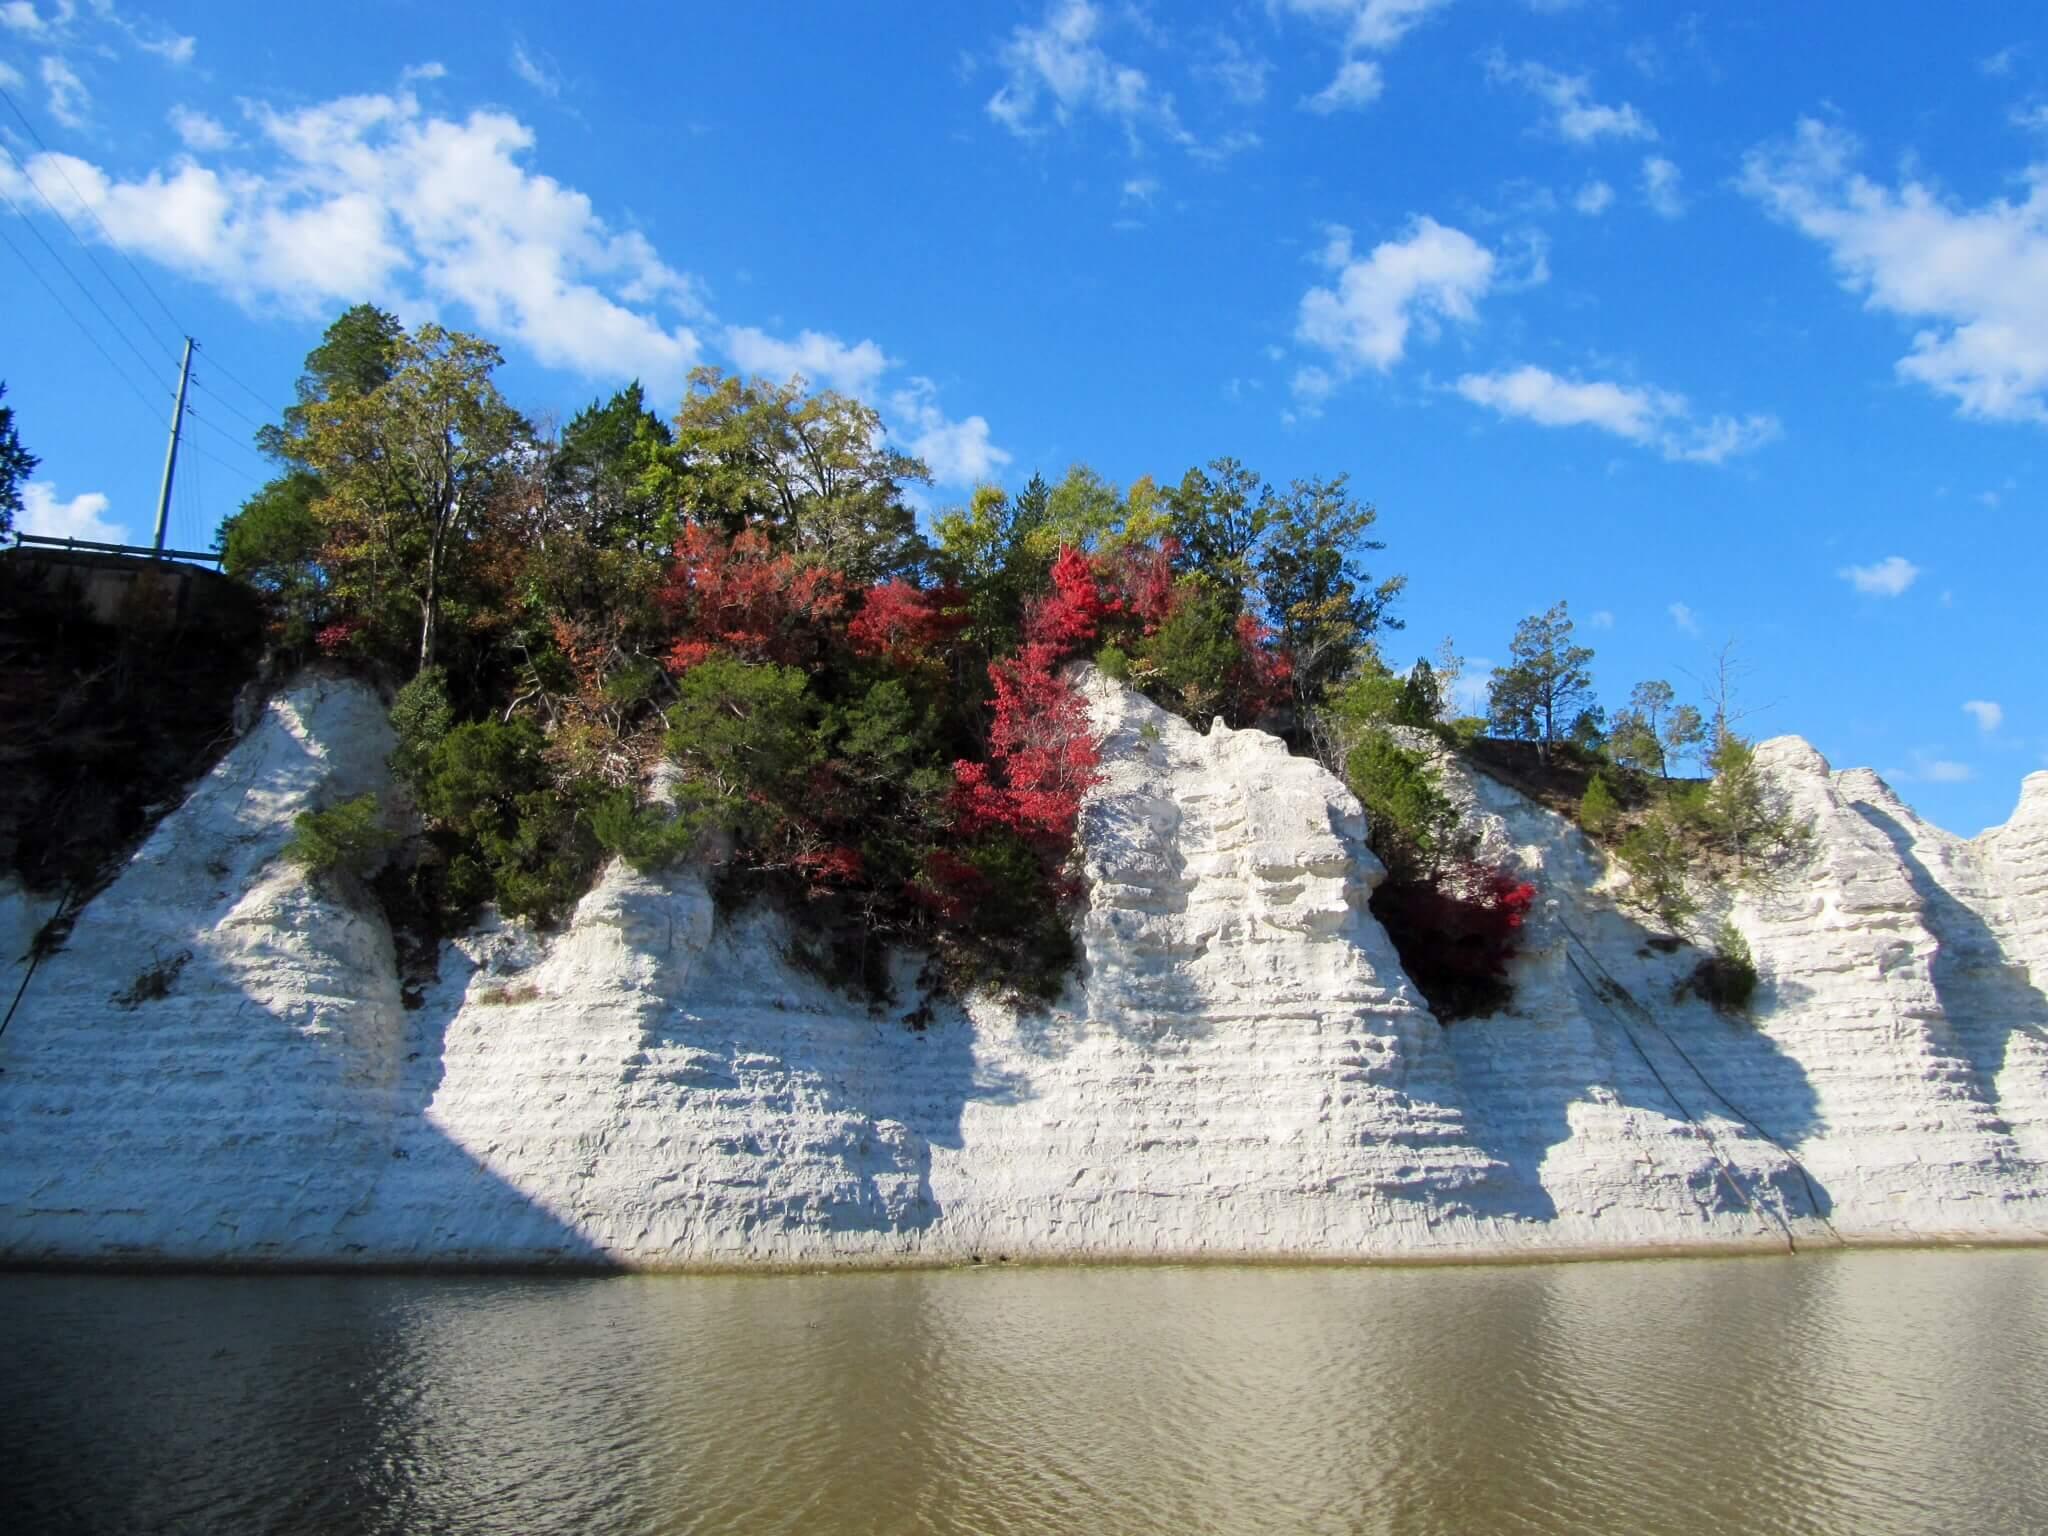 White Cliff of Epes, Alabama